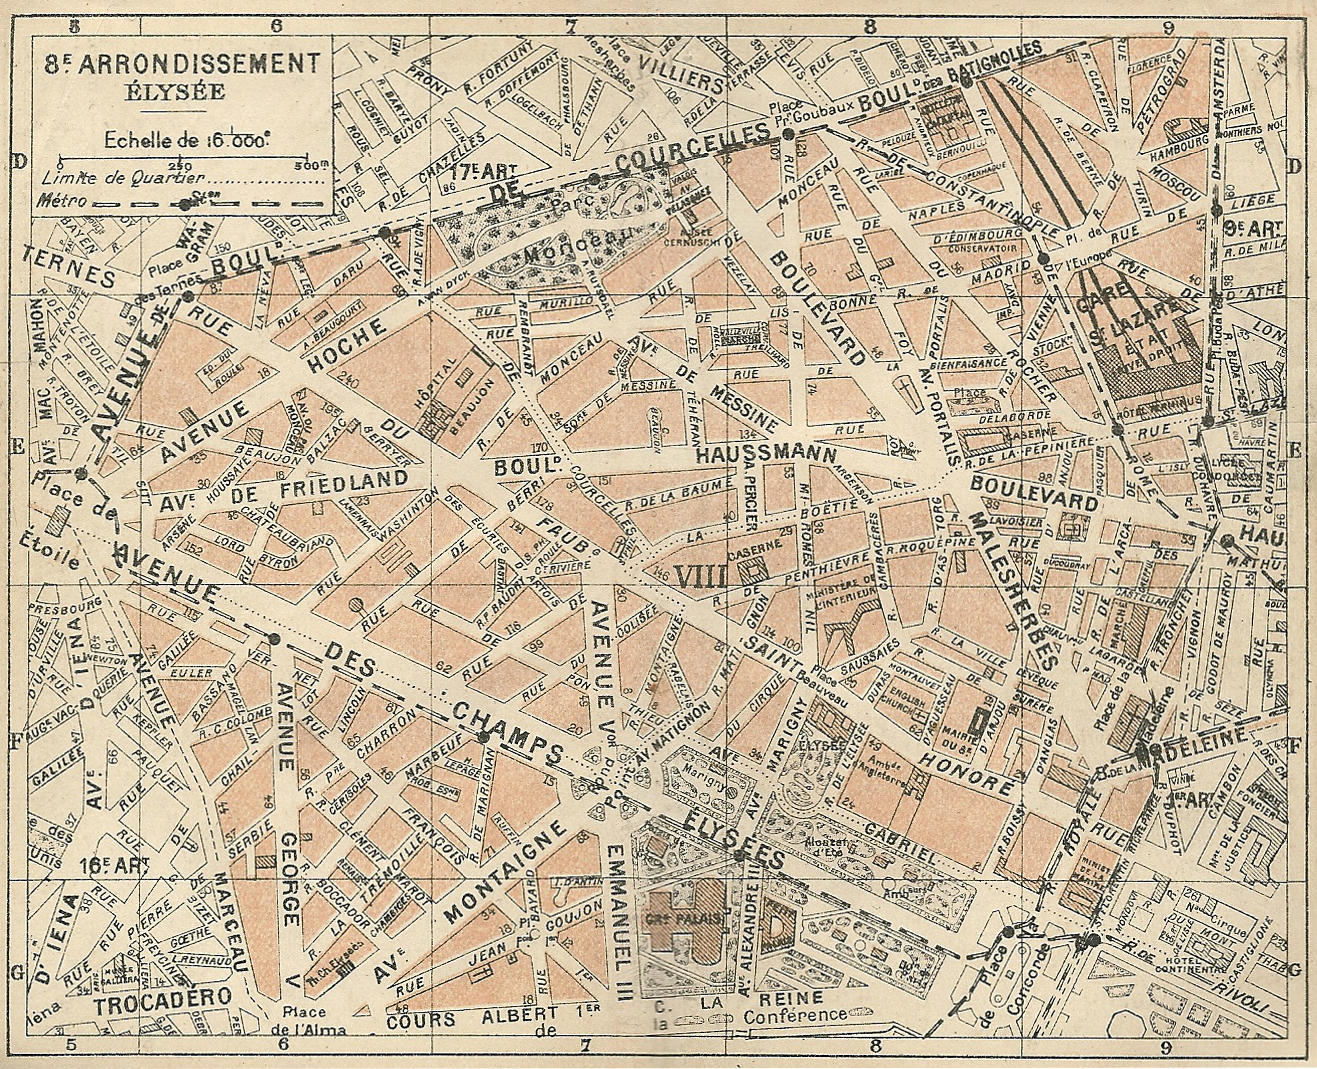 Filepariscarte Darrondissementa07jpg Wikimedia Commons